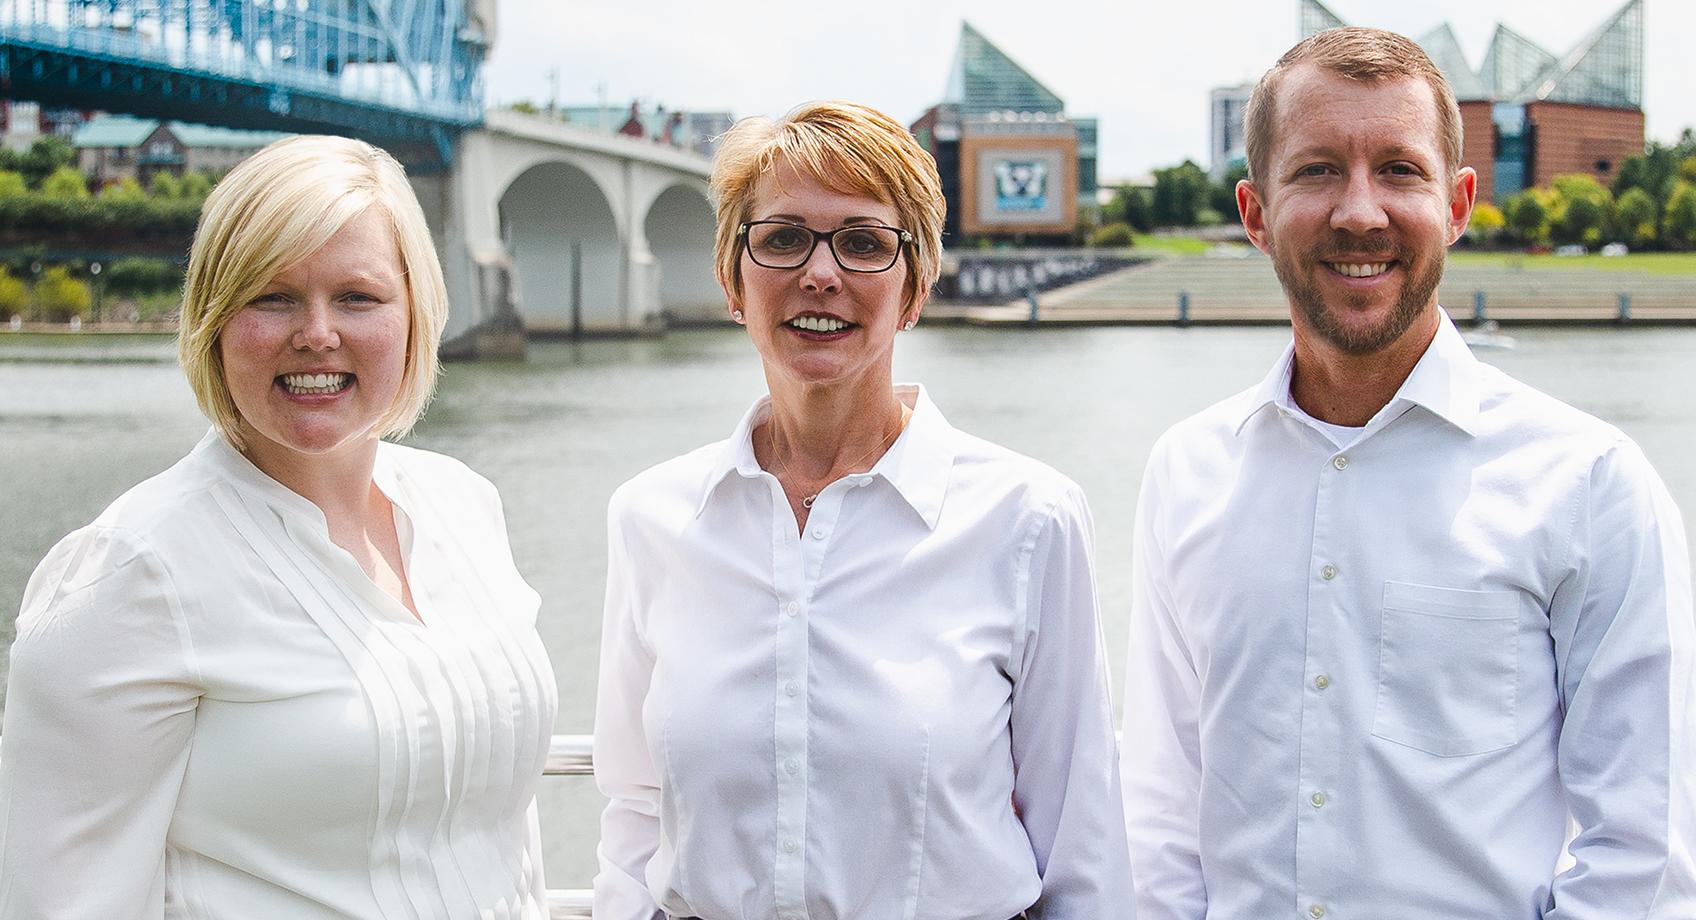 Riverfront Medicine DPC - A Better Healthcare Solution